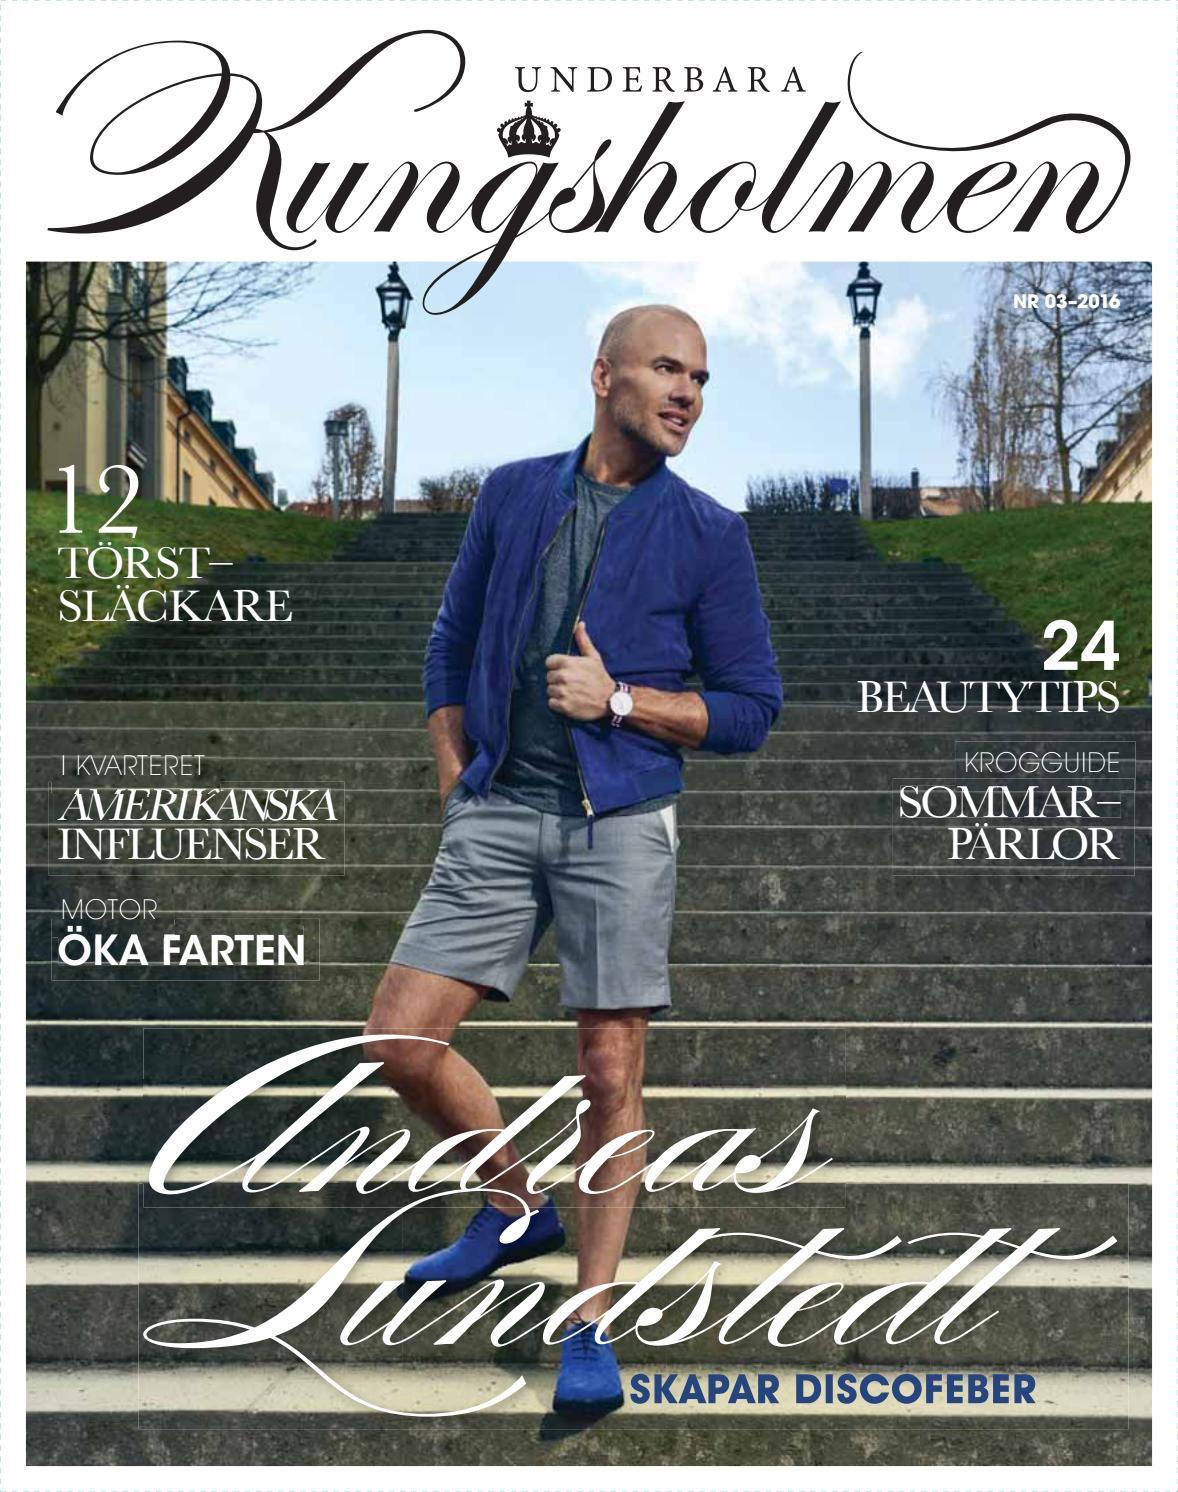 Underbara kungsholme 2016 03 by Alm   Möller Royal Publishing Group AB -  issuu a304886e12ed1